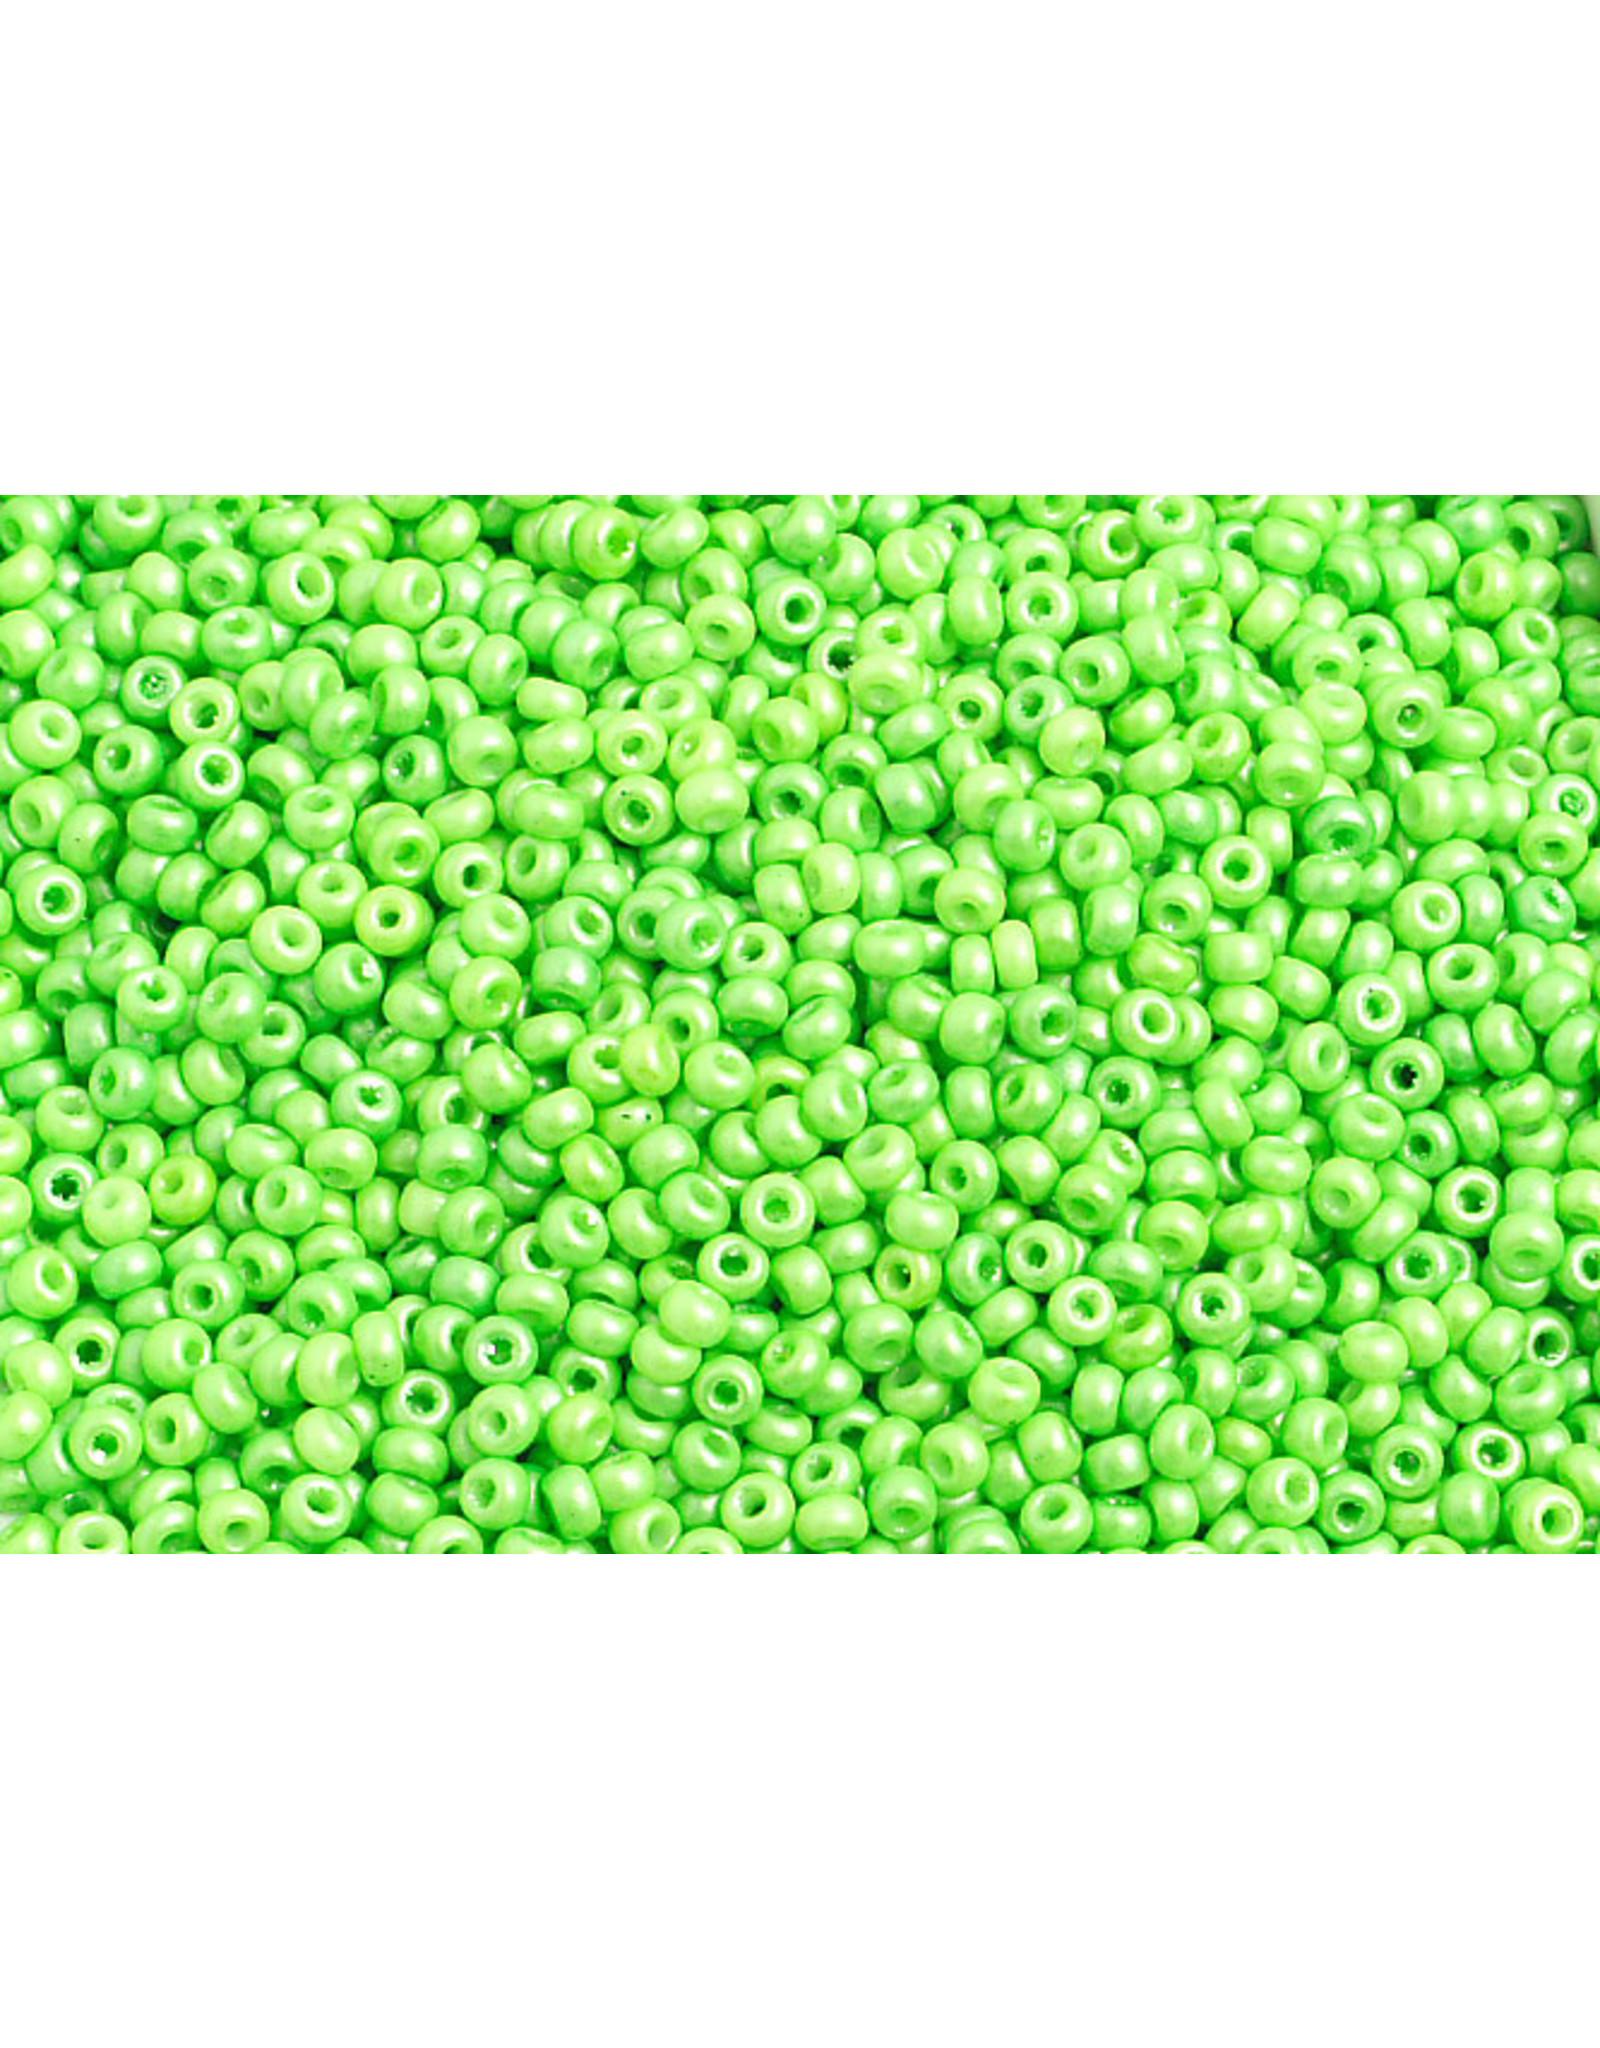 Czech 2333B 10  Seed 250g Opaque Shiny Green